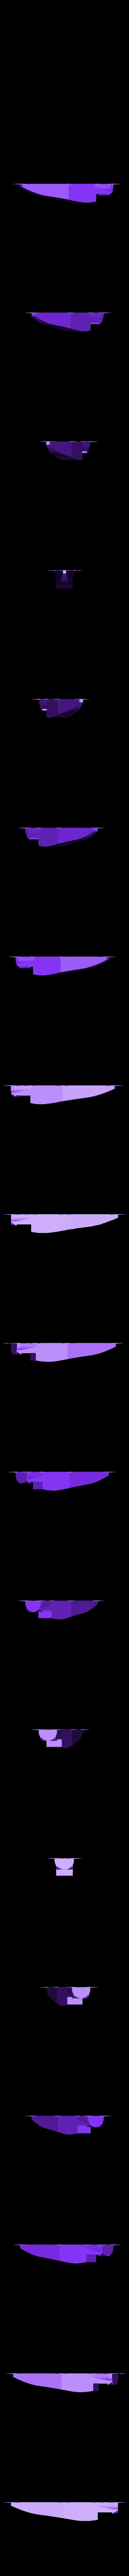 10-29-10001t.STL Télécharger fichier STL gratuit Fokker DR.1 Triplane • Design imprimable en 3D, Ventwallader